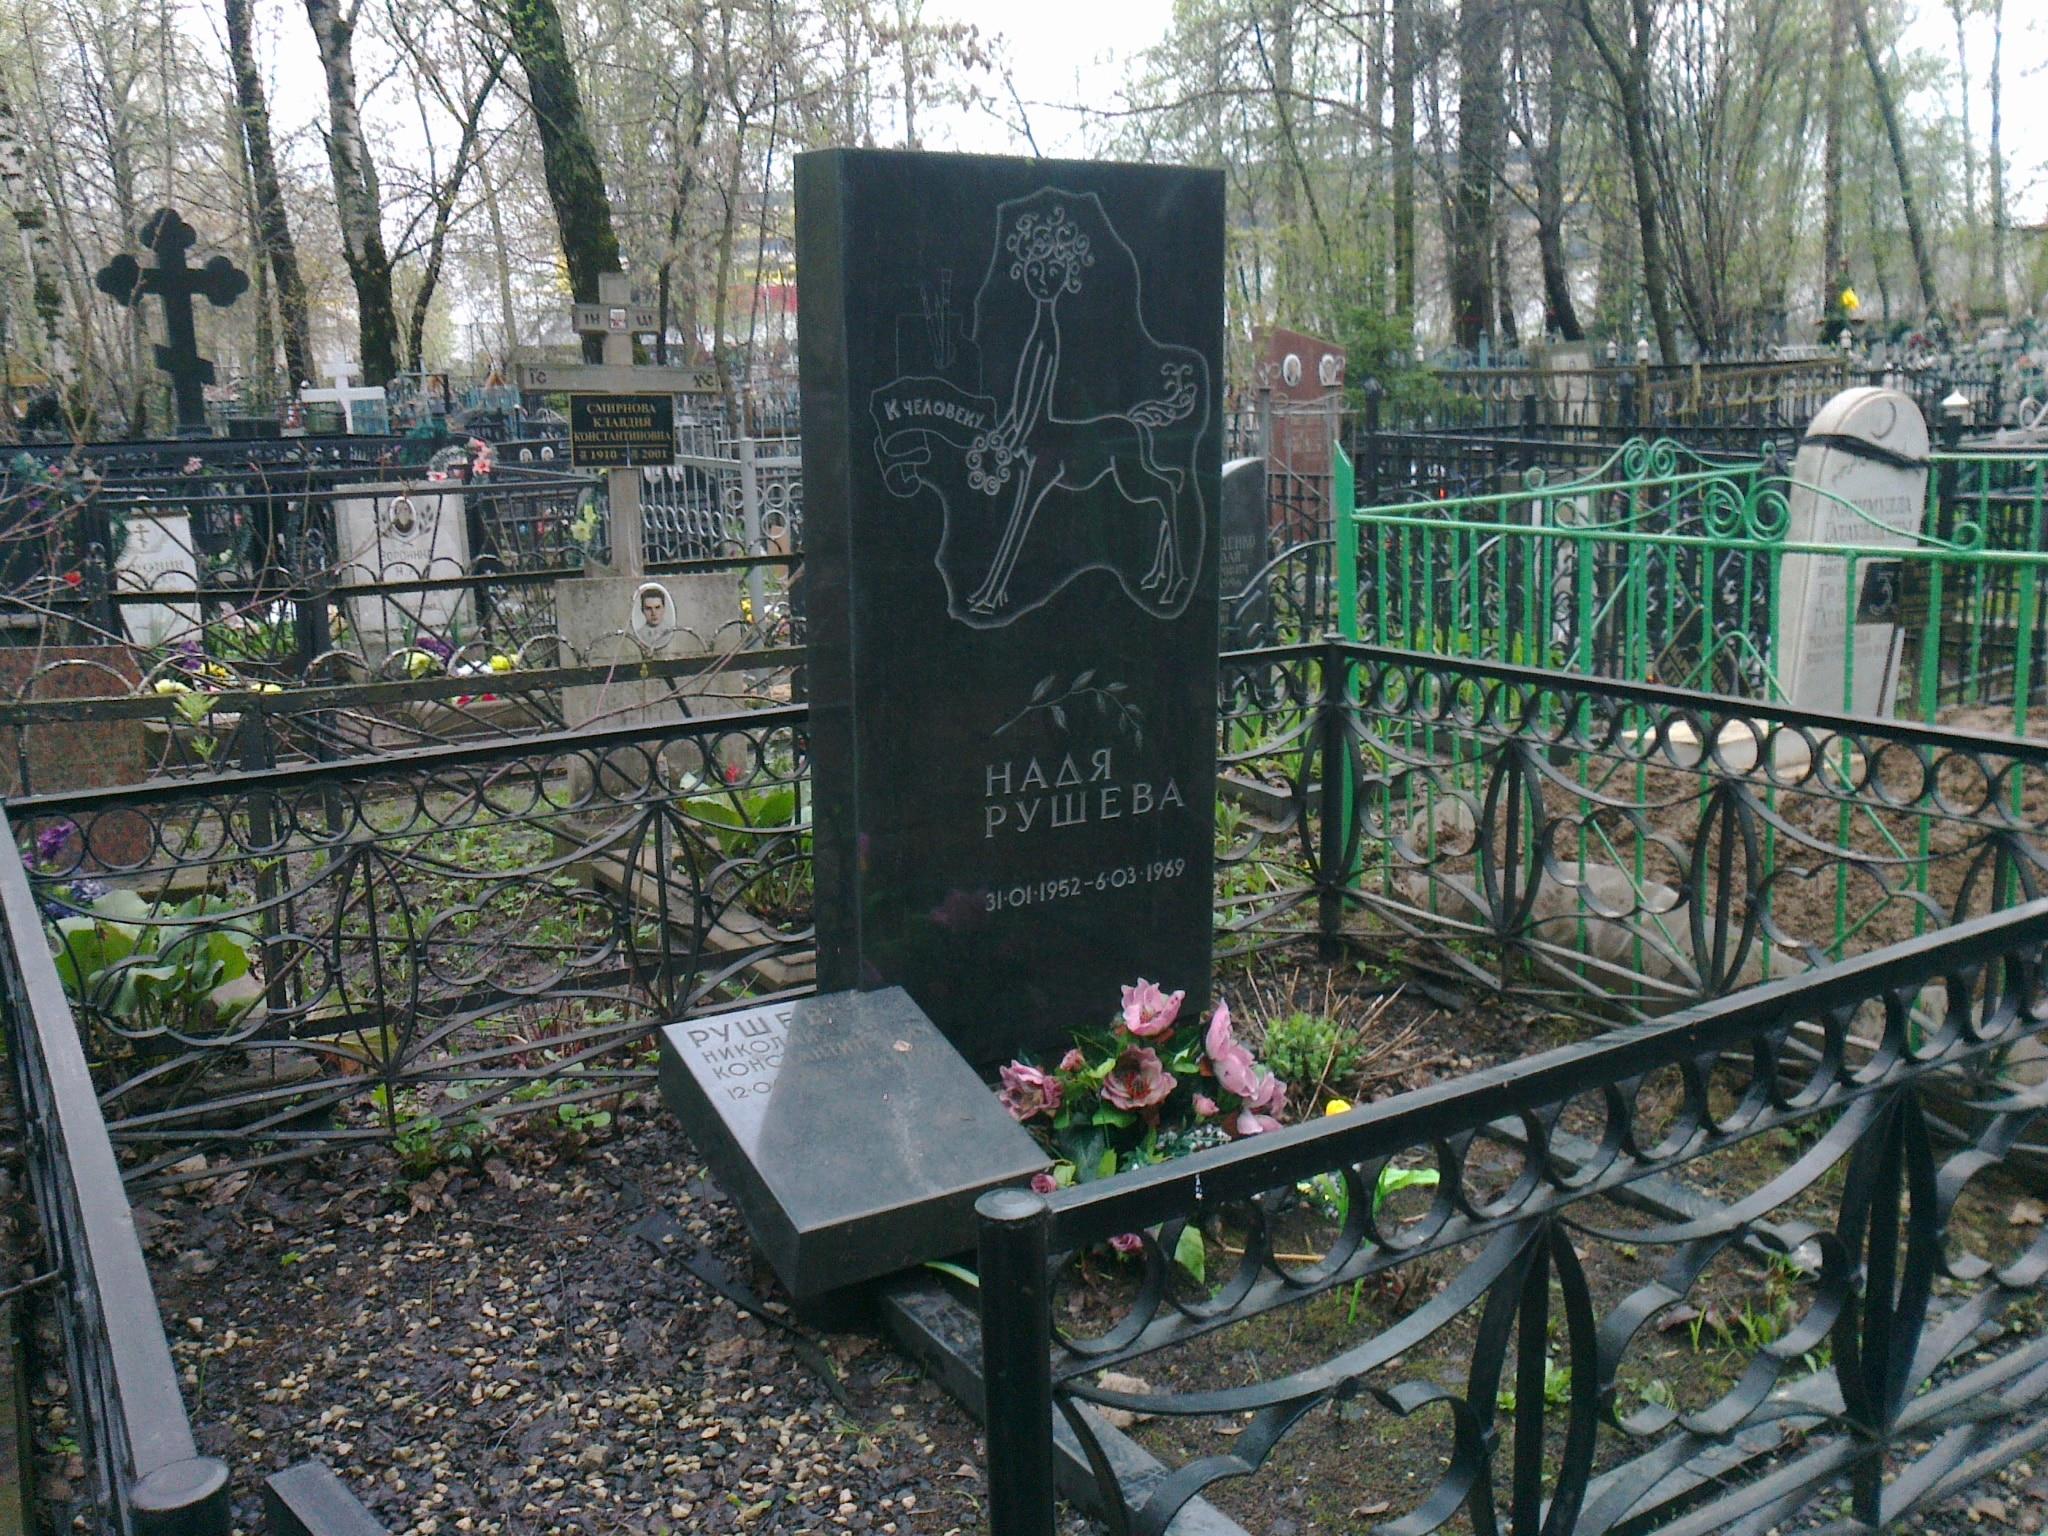 Надежда Николаевна Рушева